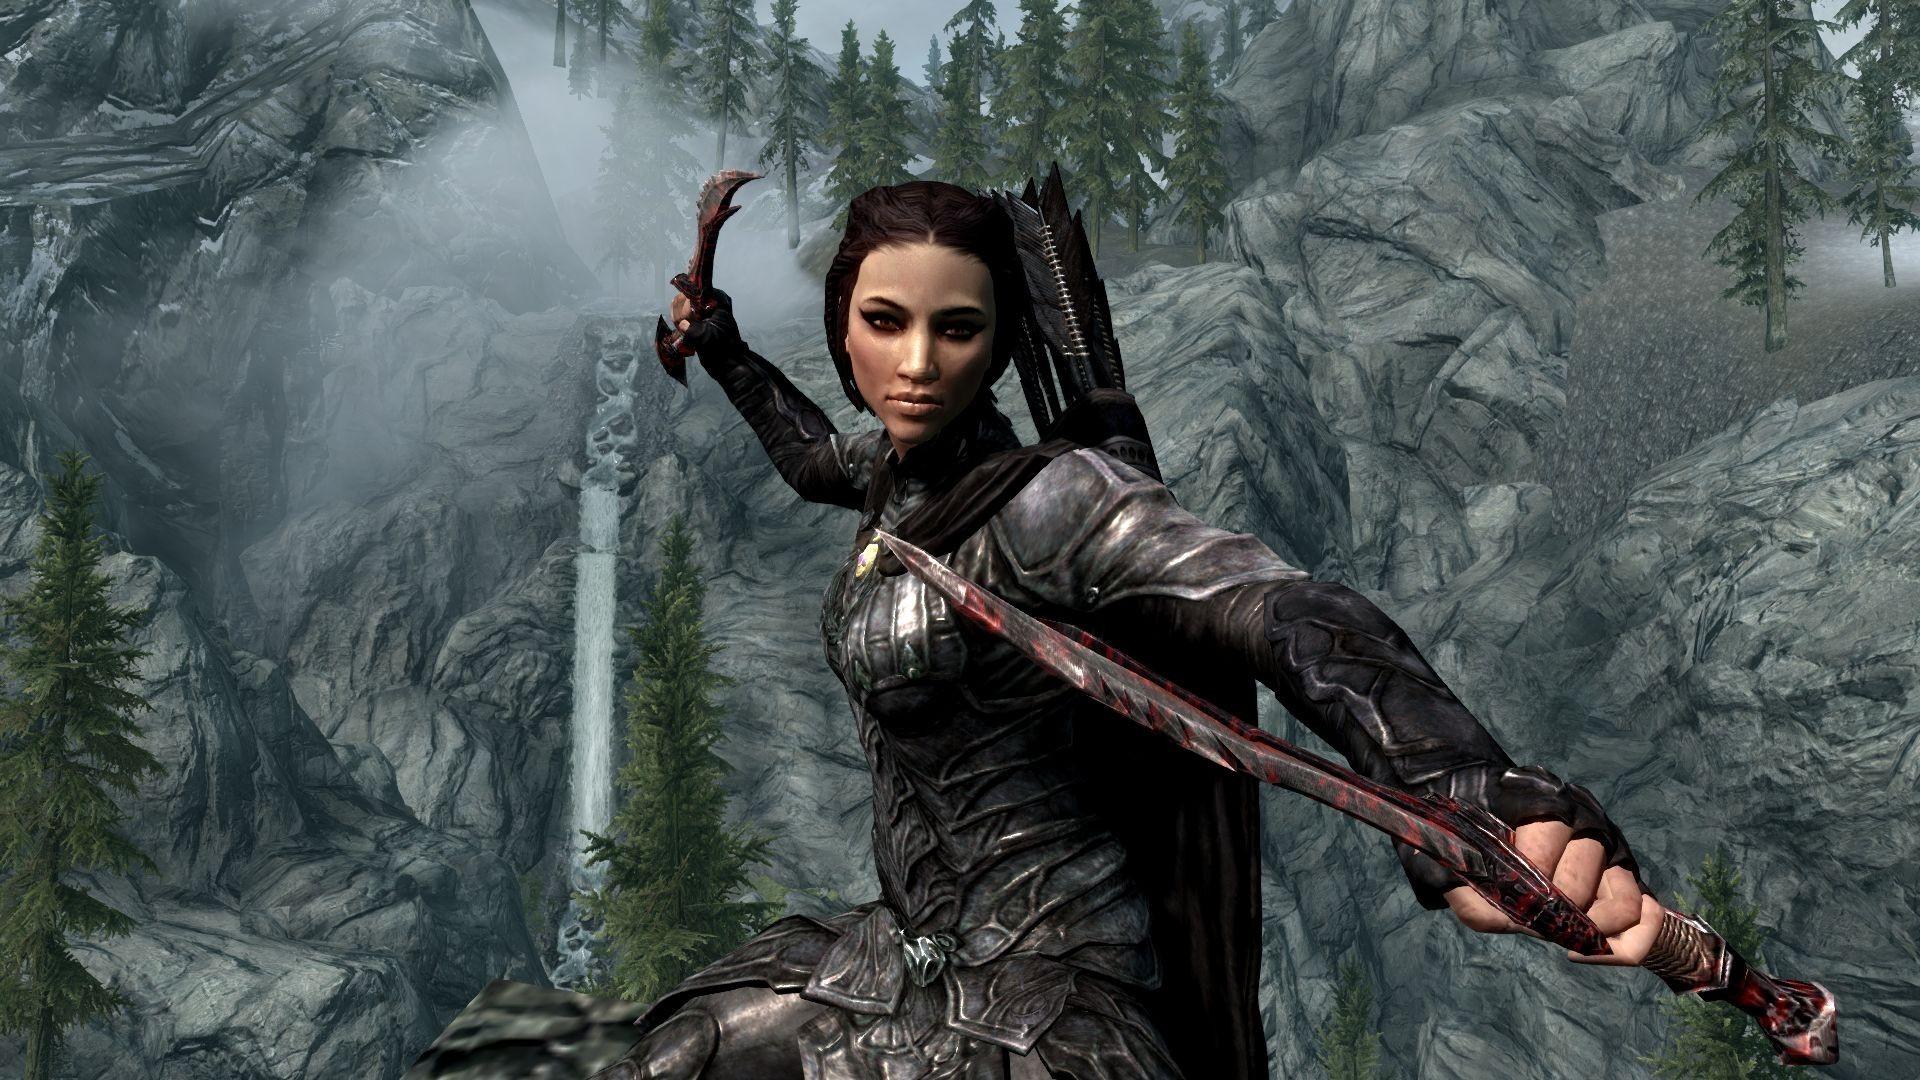 Skyrim Female Warrior Wallpaper HD